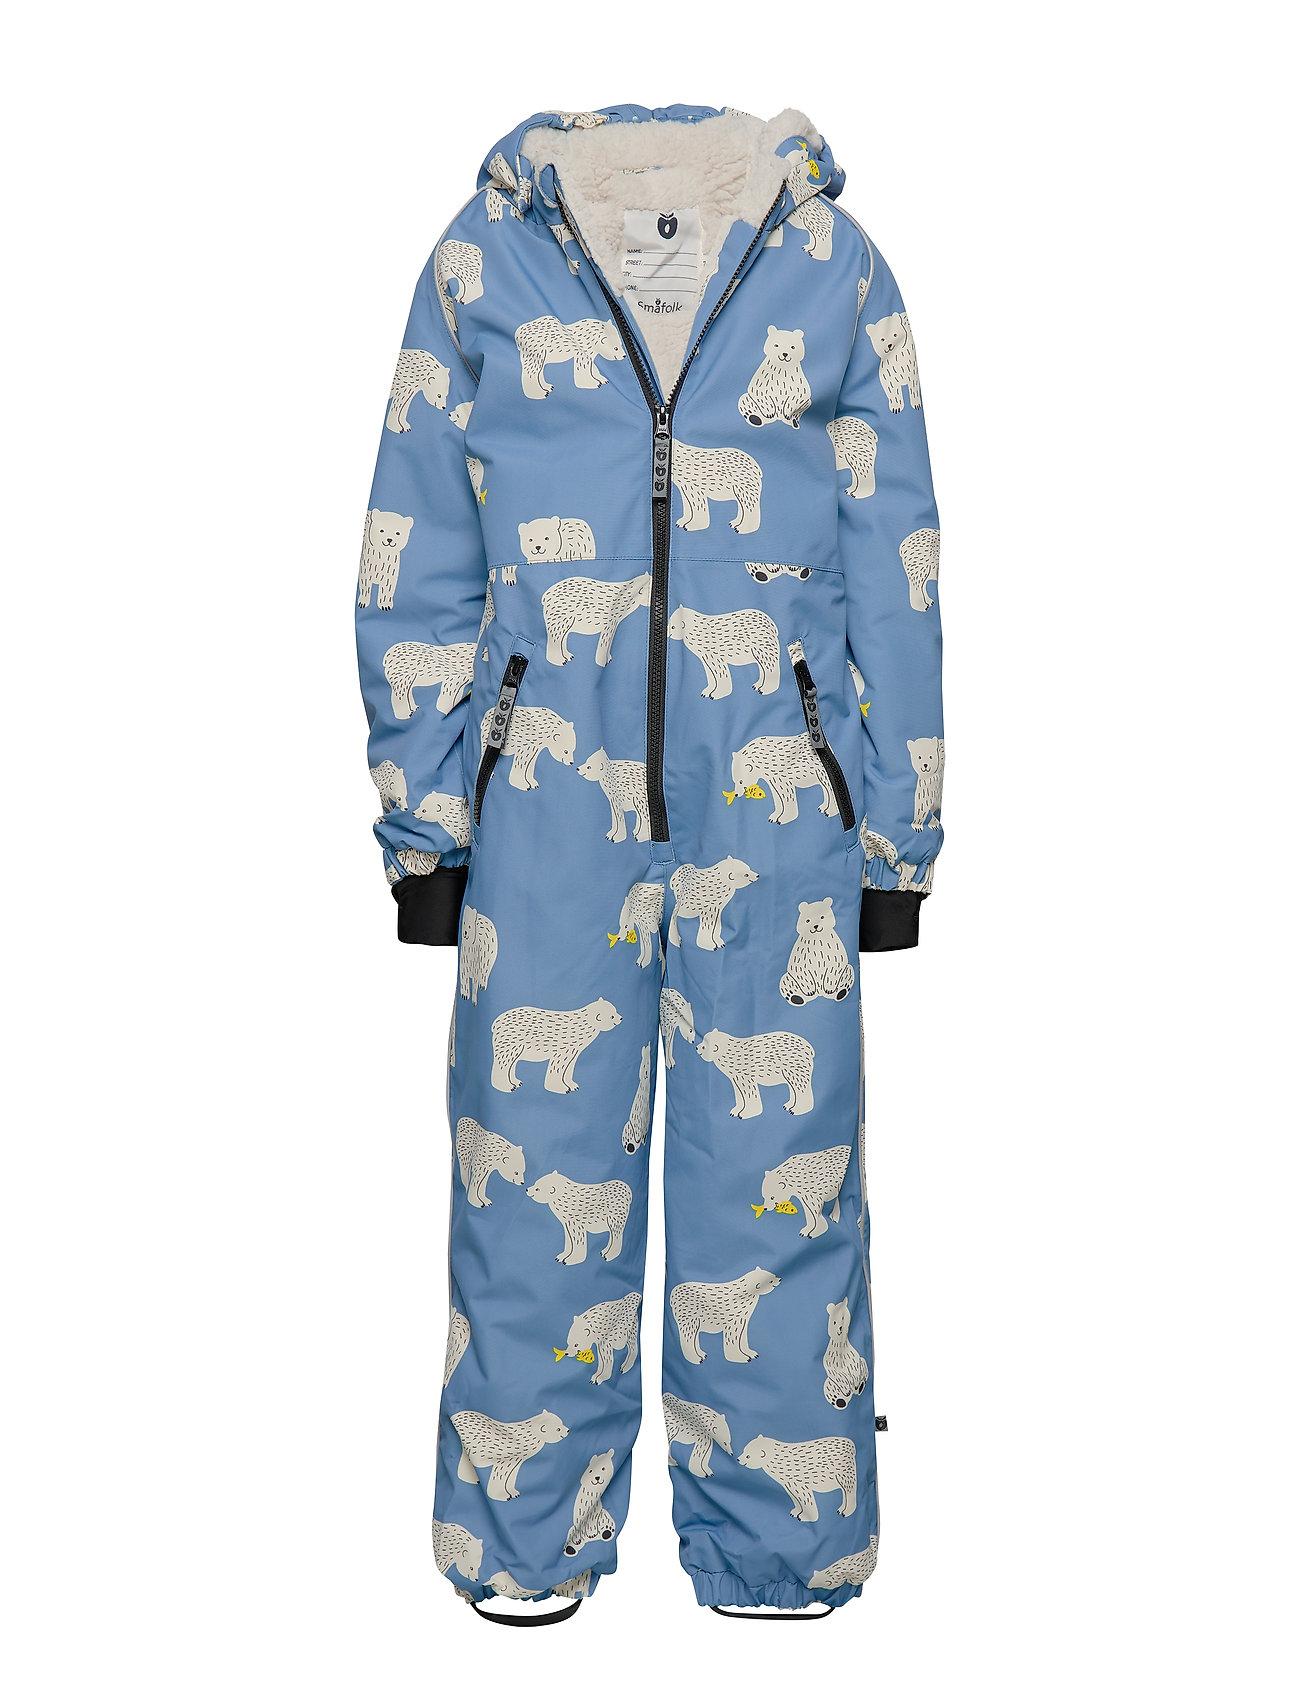 Småfolk Snowsuit, 1 zipper. Bear - WINTER BLUE